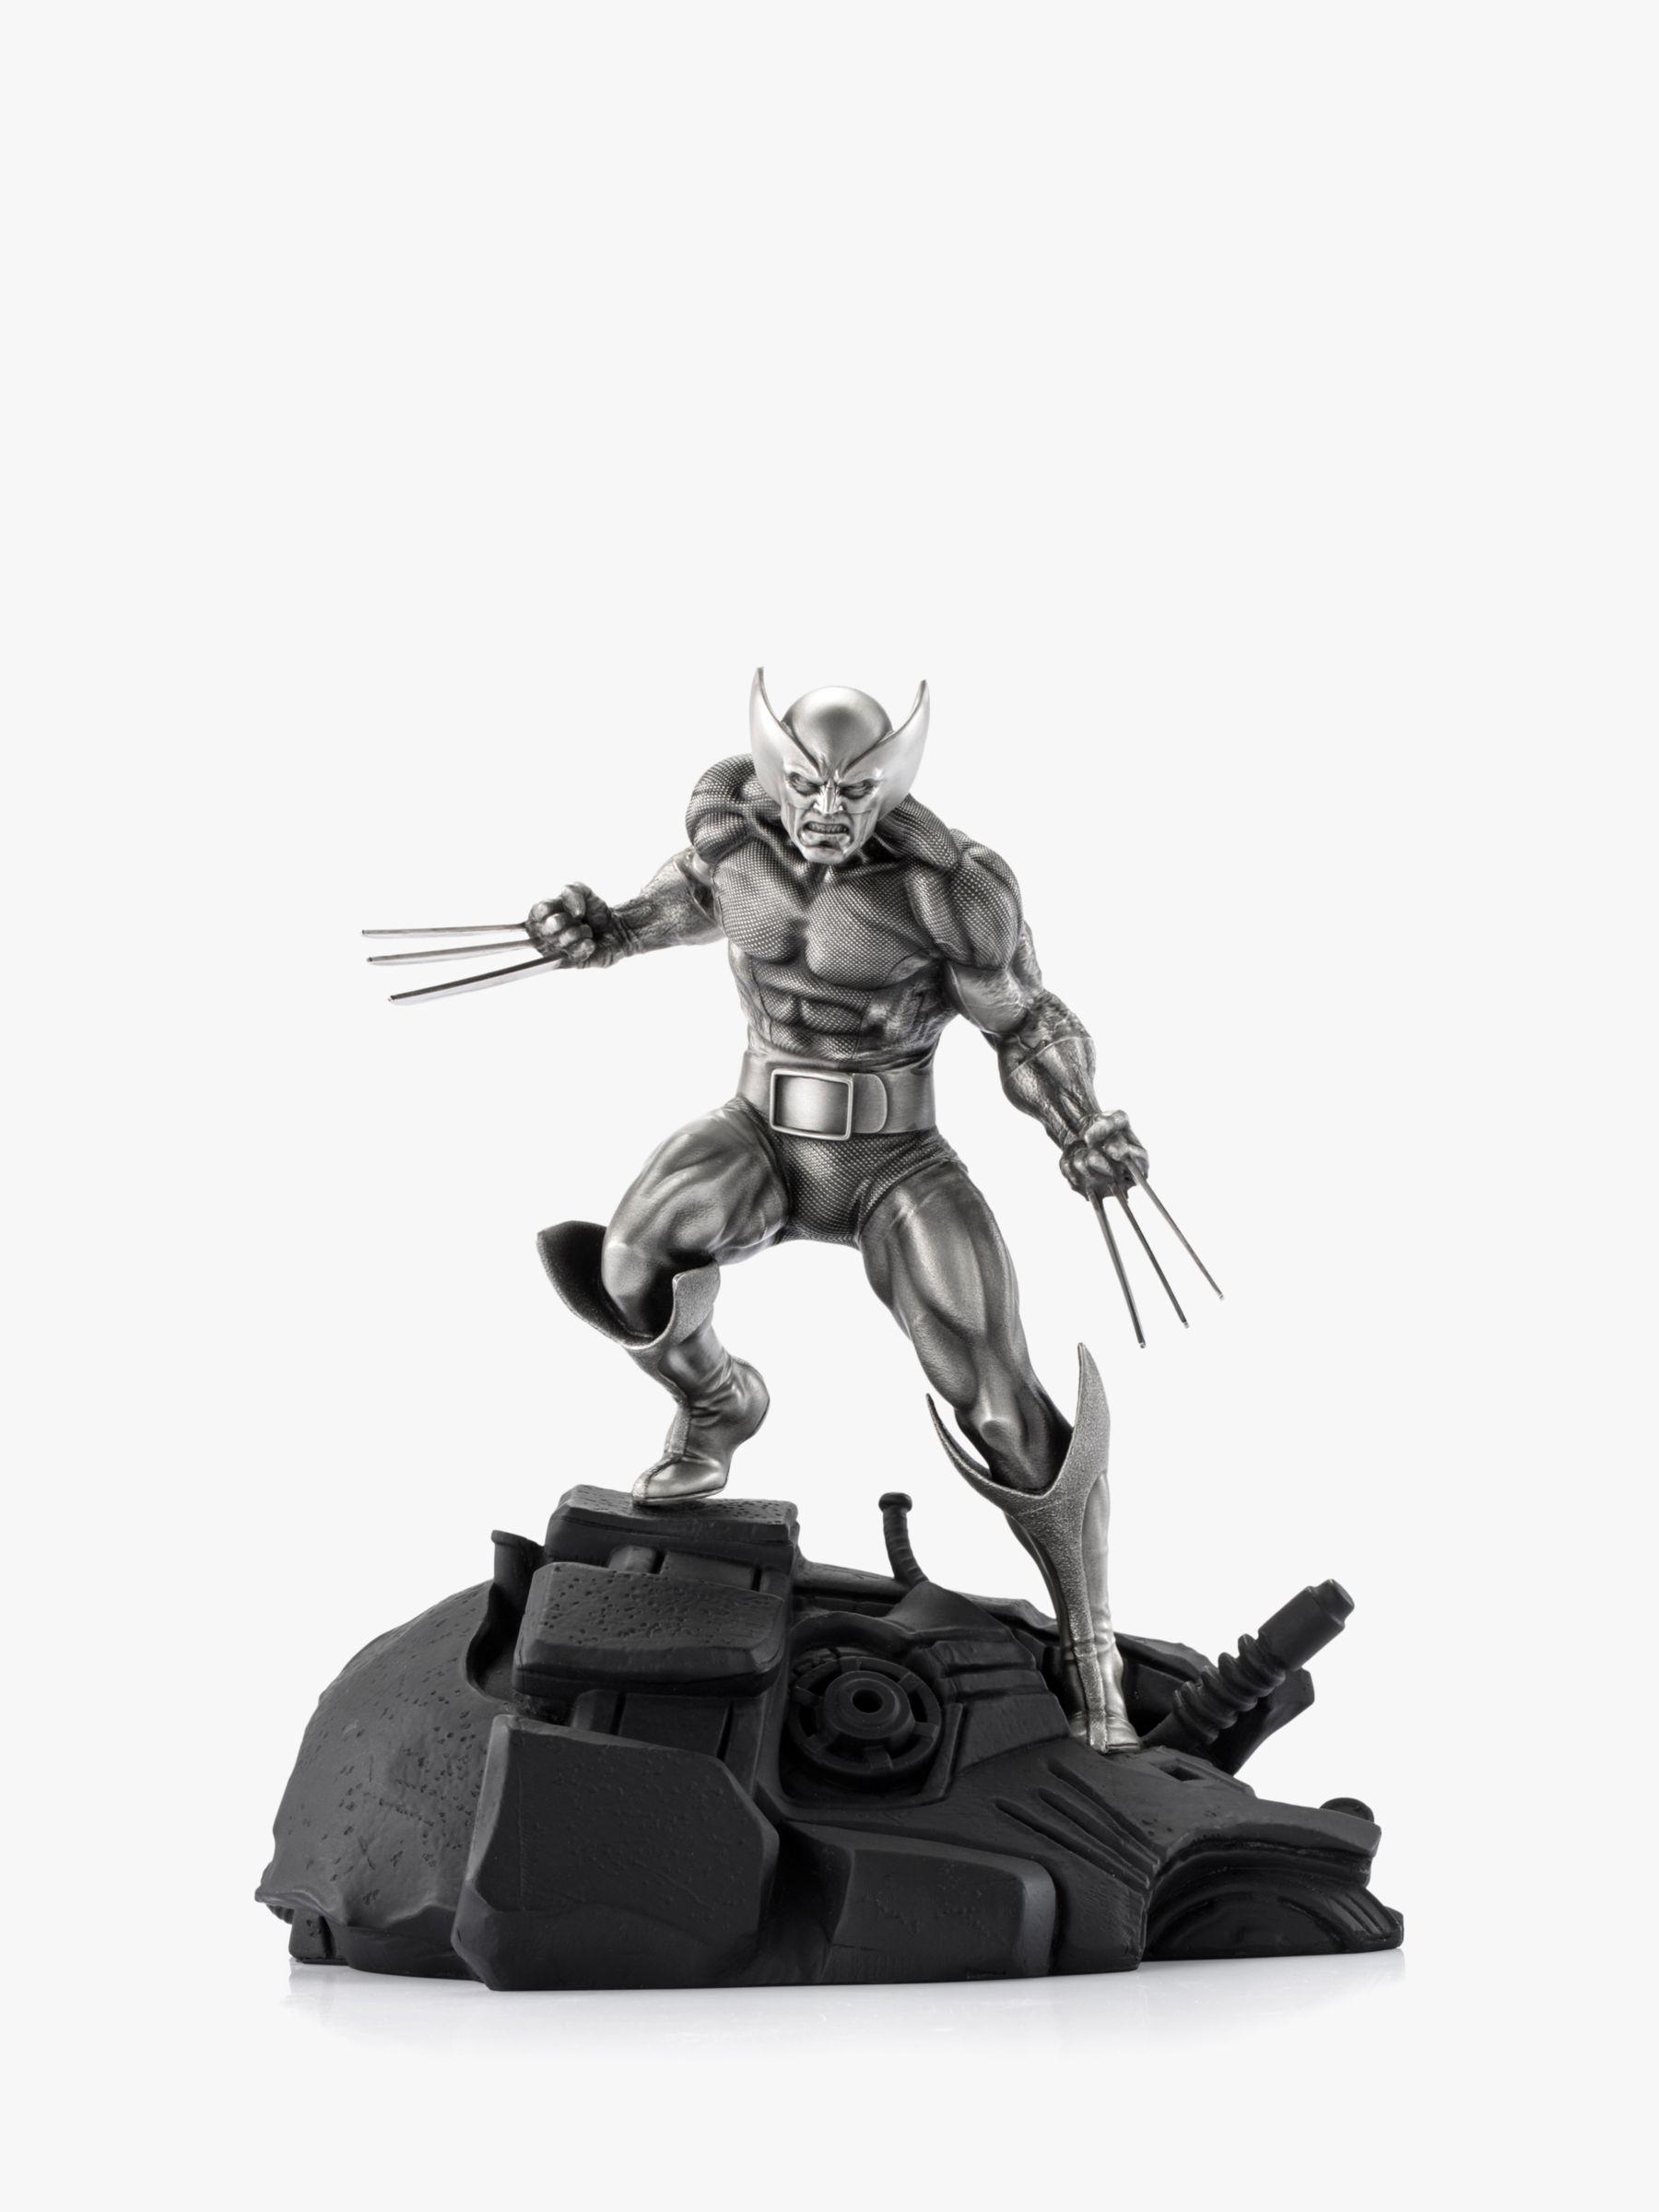 Royal Selangor Royal Selangor Marvel Wolverine Figurine